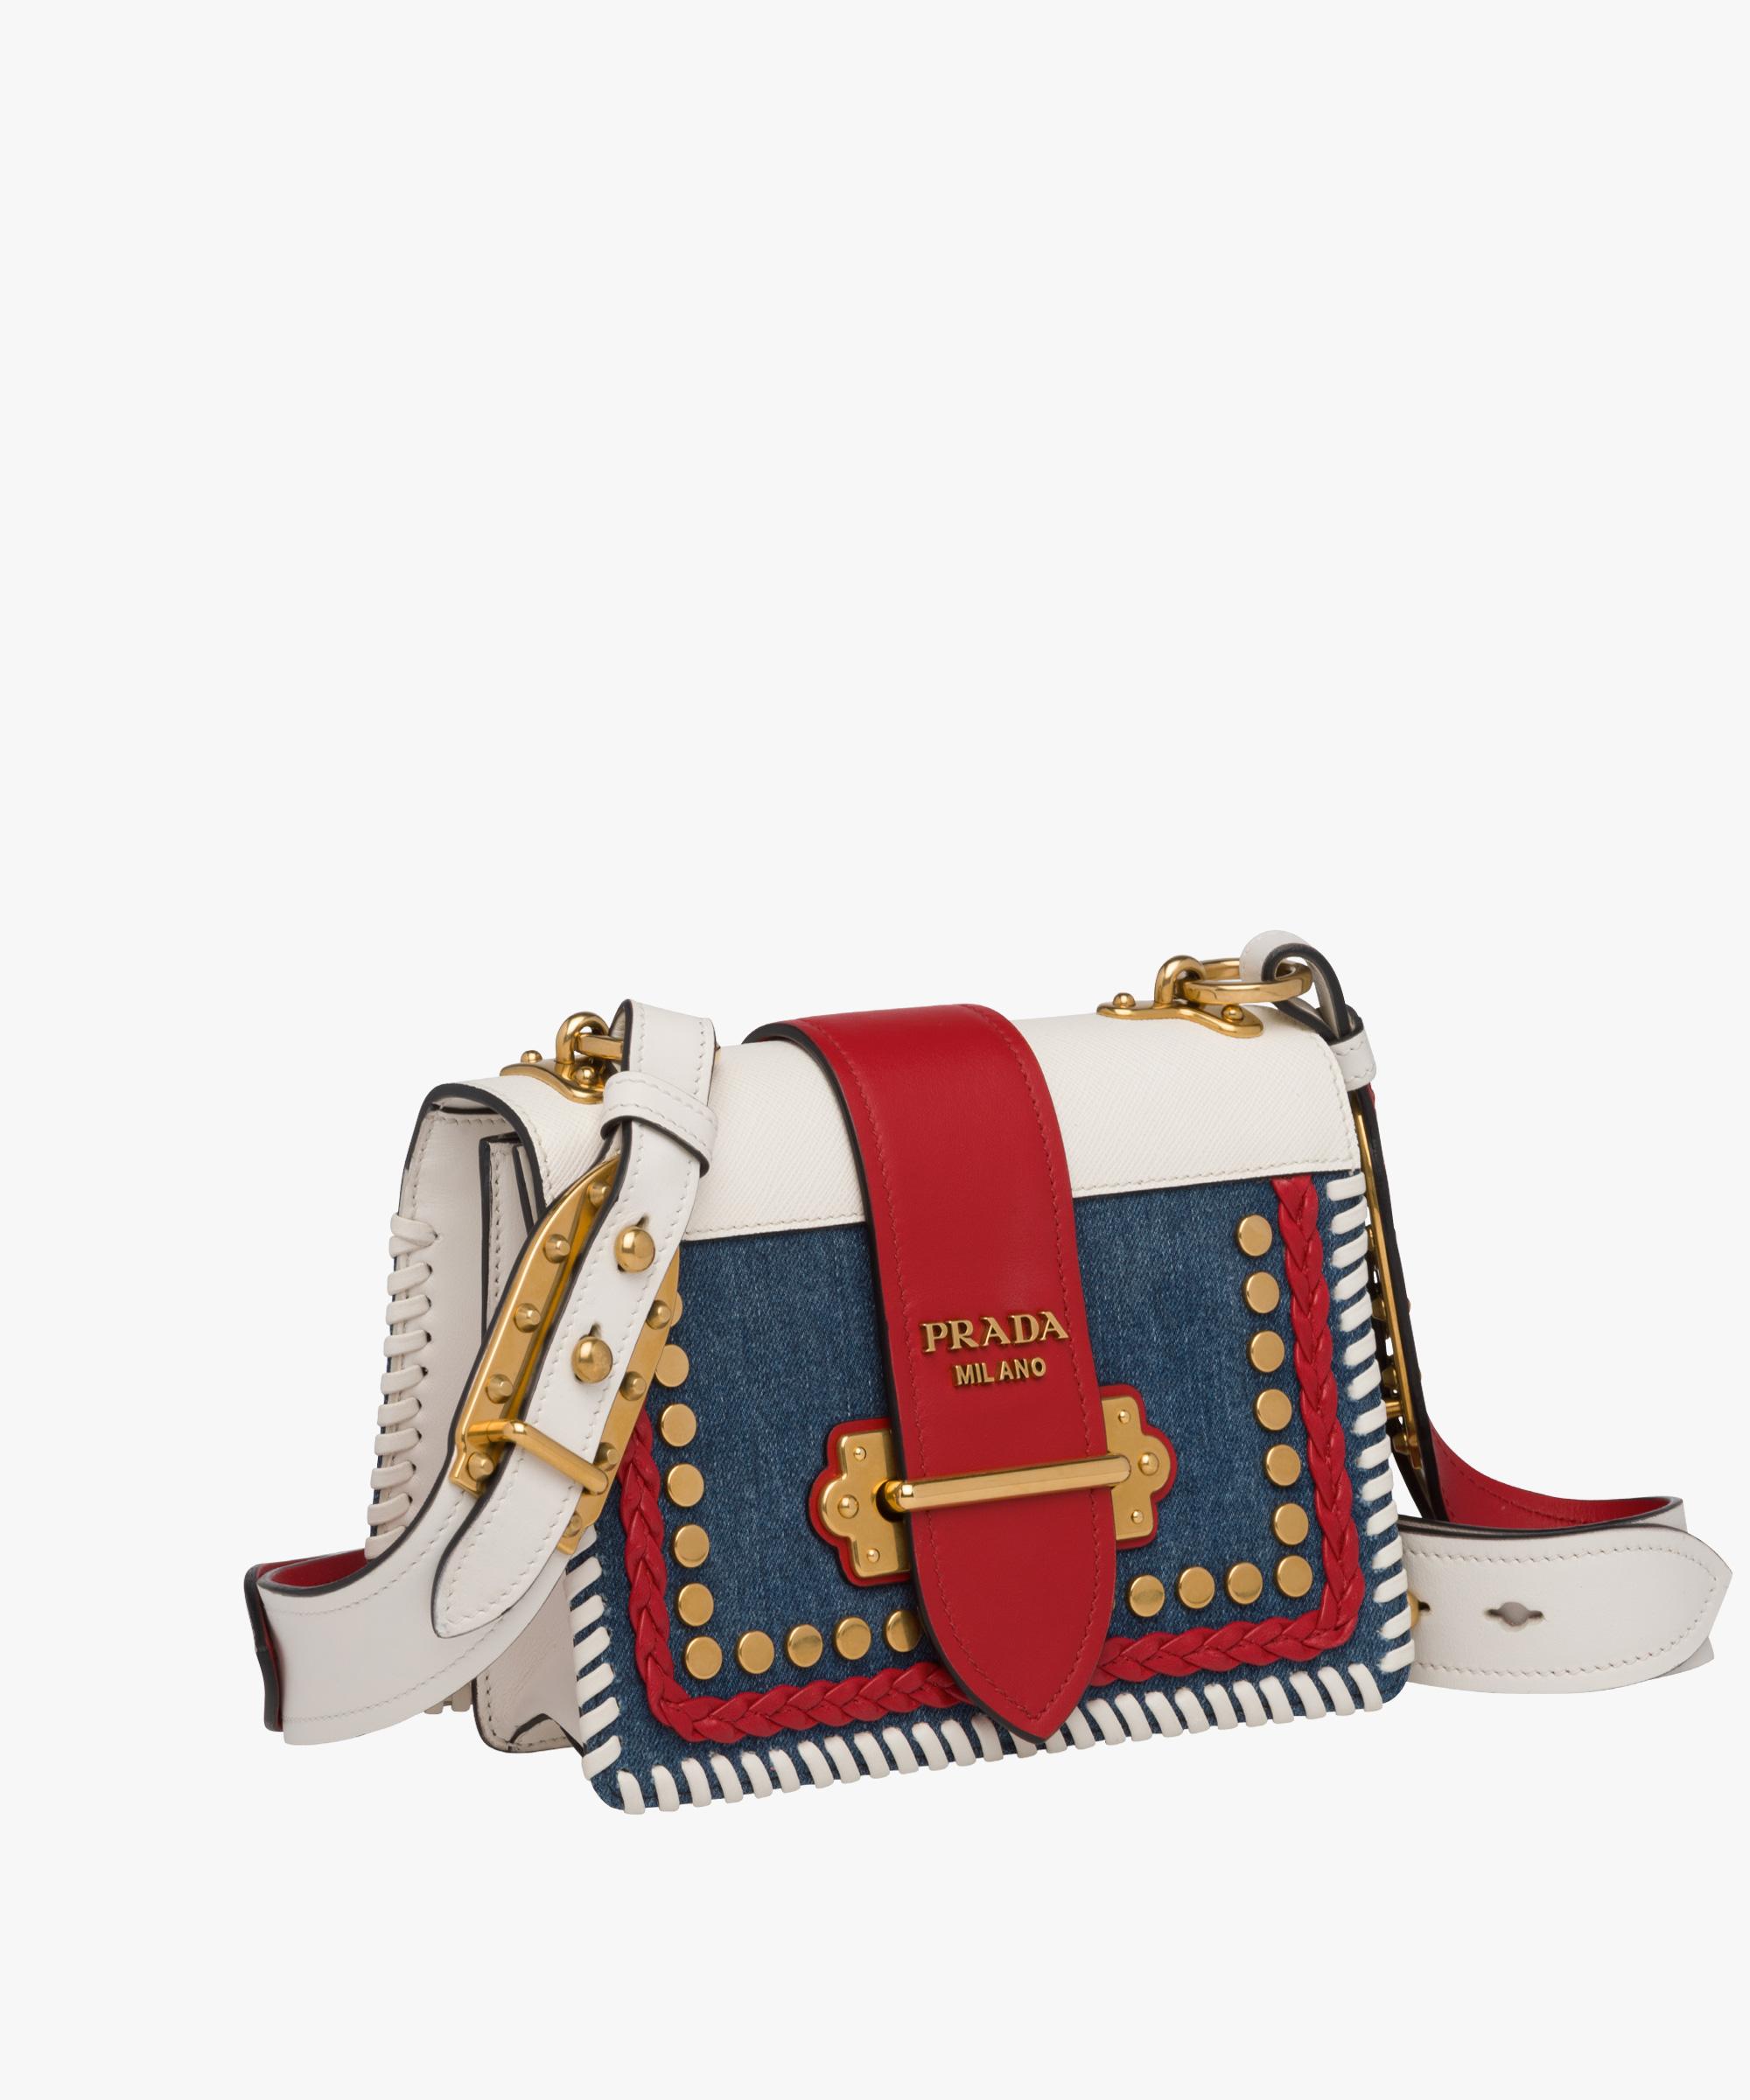 7d994181d366 Prada Cahier calf leather and denim bag